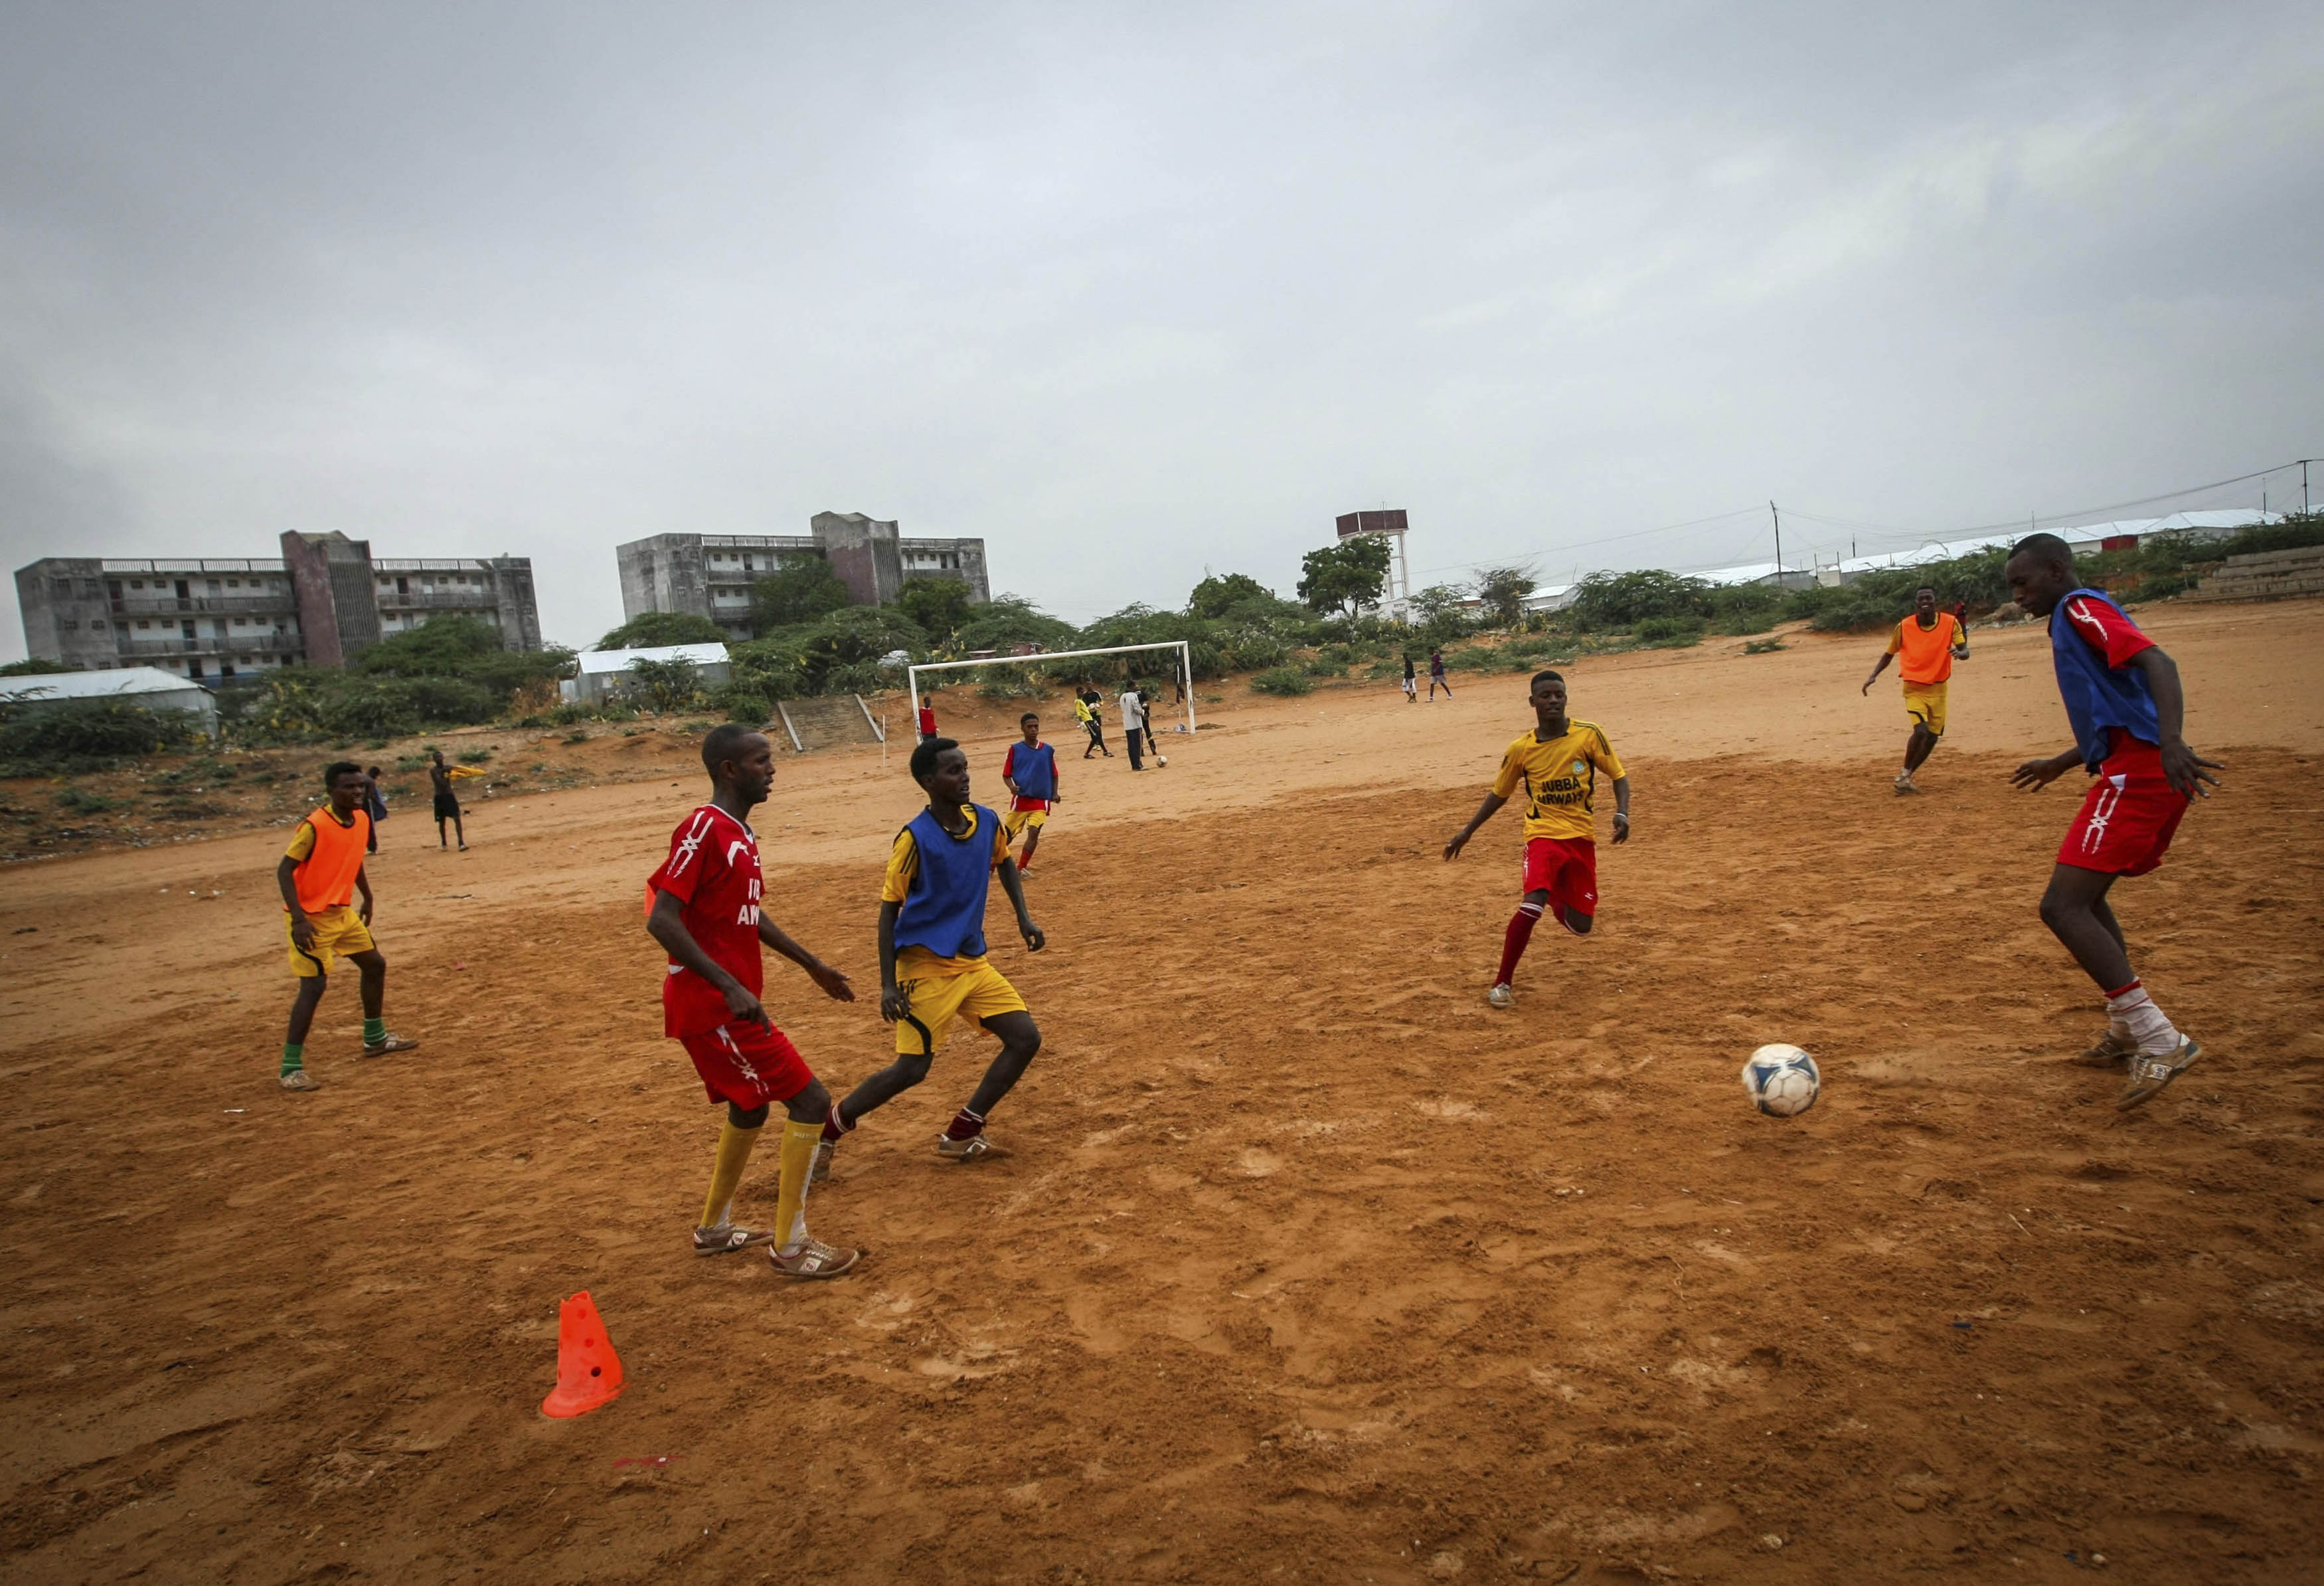 FIFA Supports Somalia Football « Sonny Side of Sports